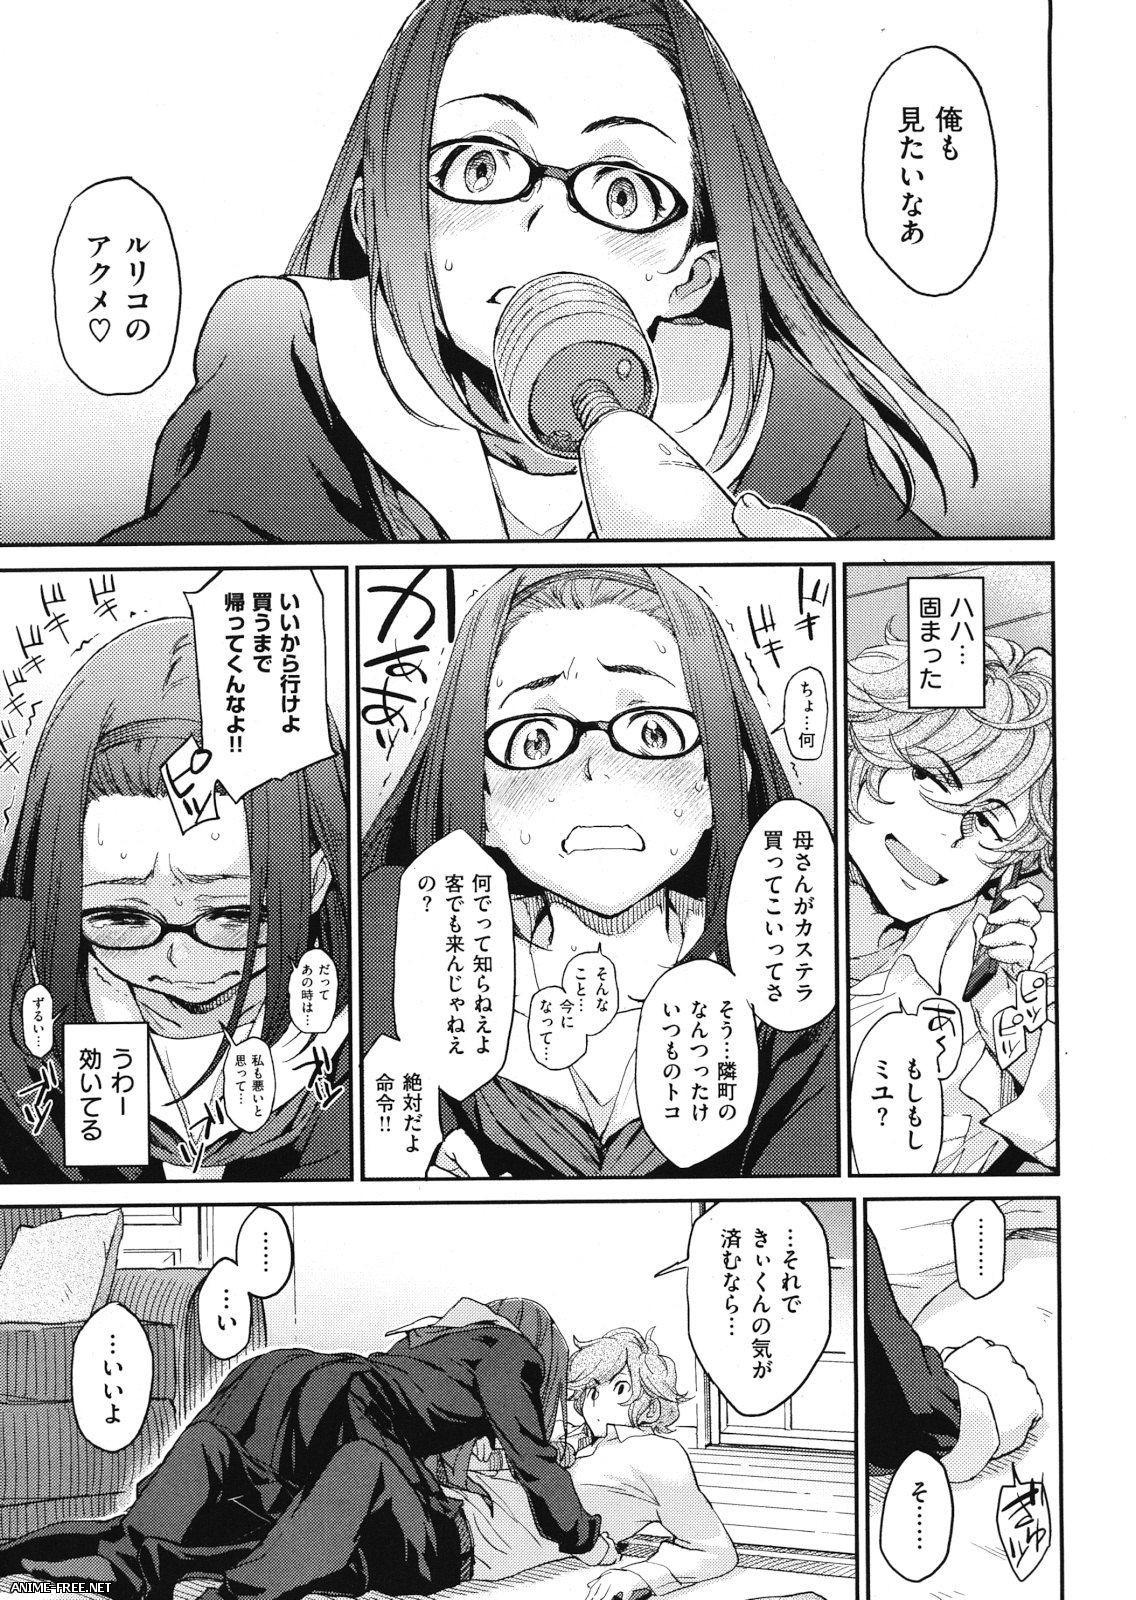 Minato Fumi — Сборник хентай манги [Cen] [ENG,JAP,RUS] Hentai Manga